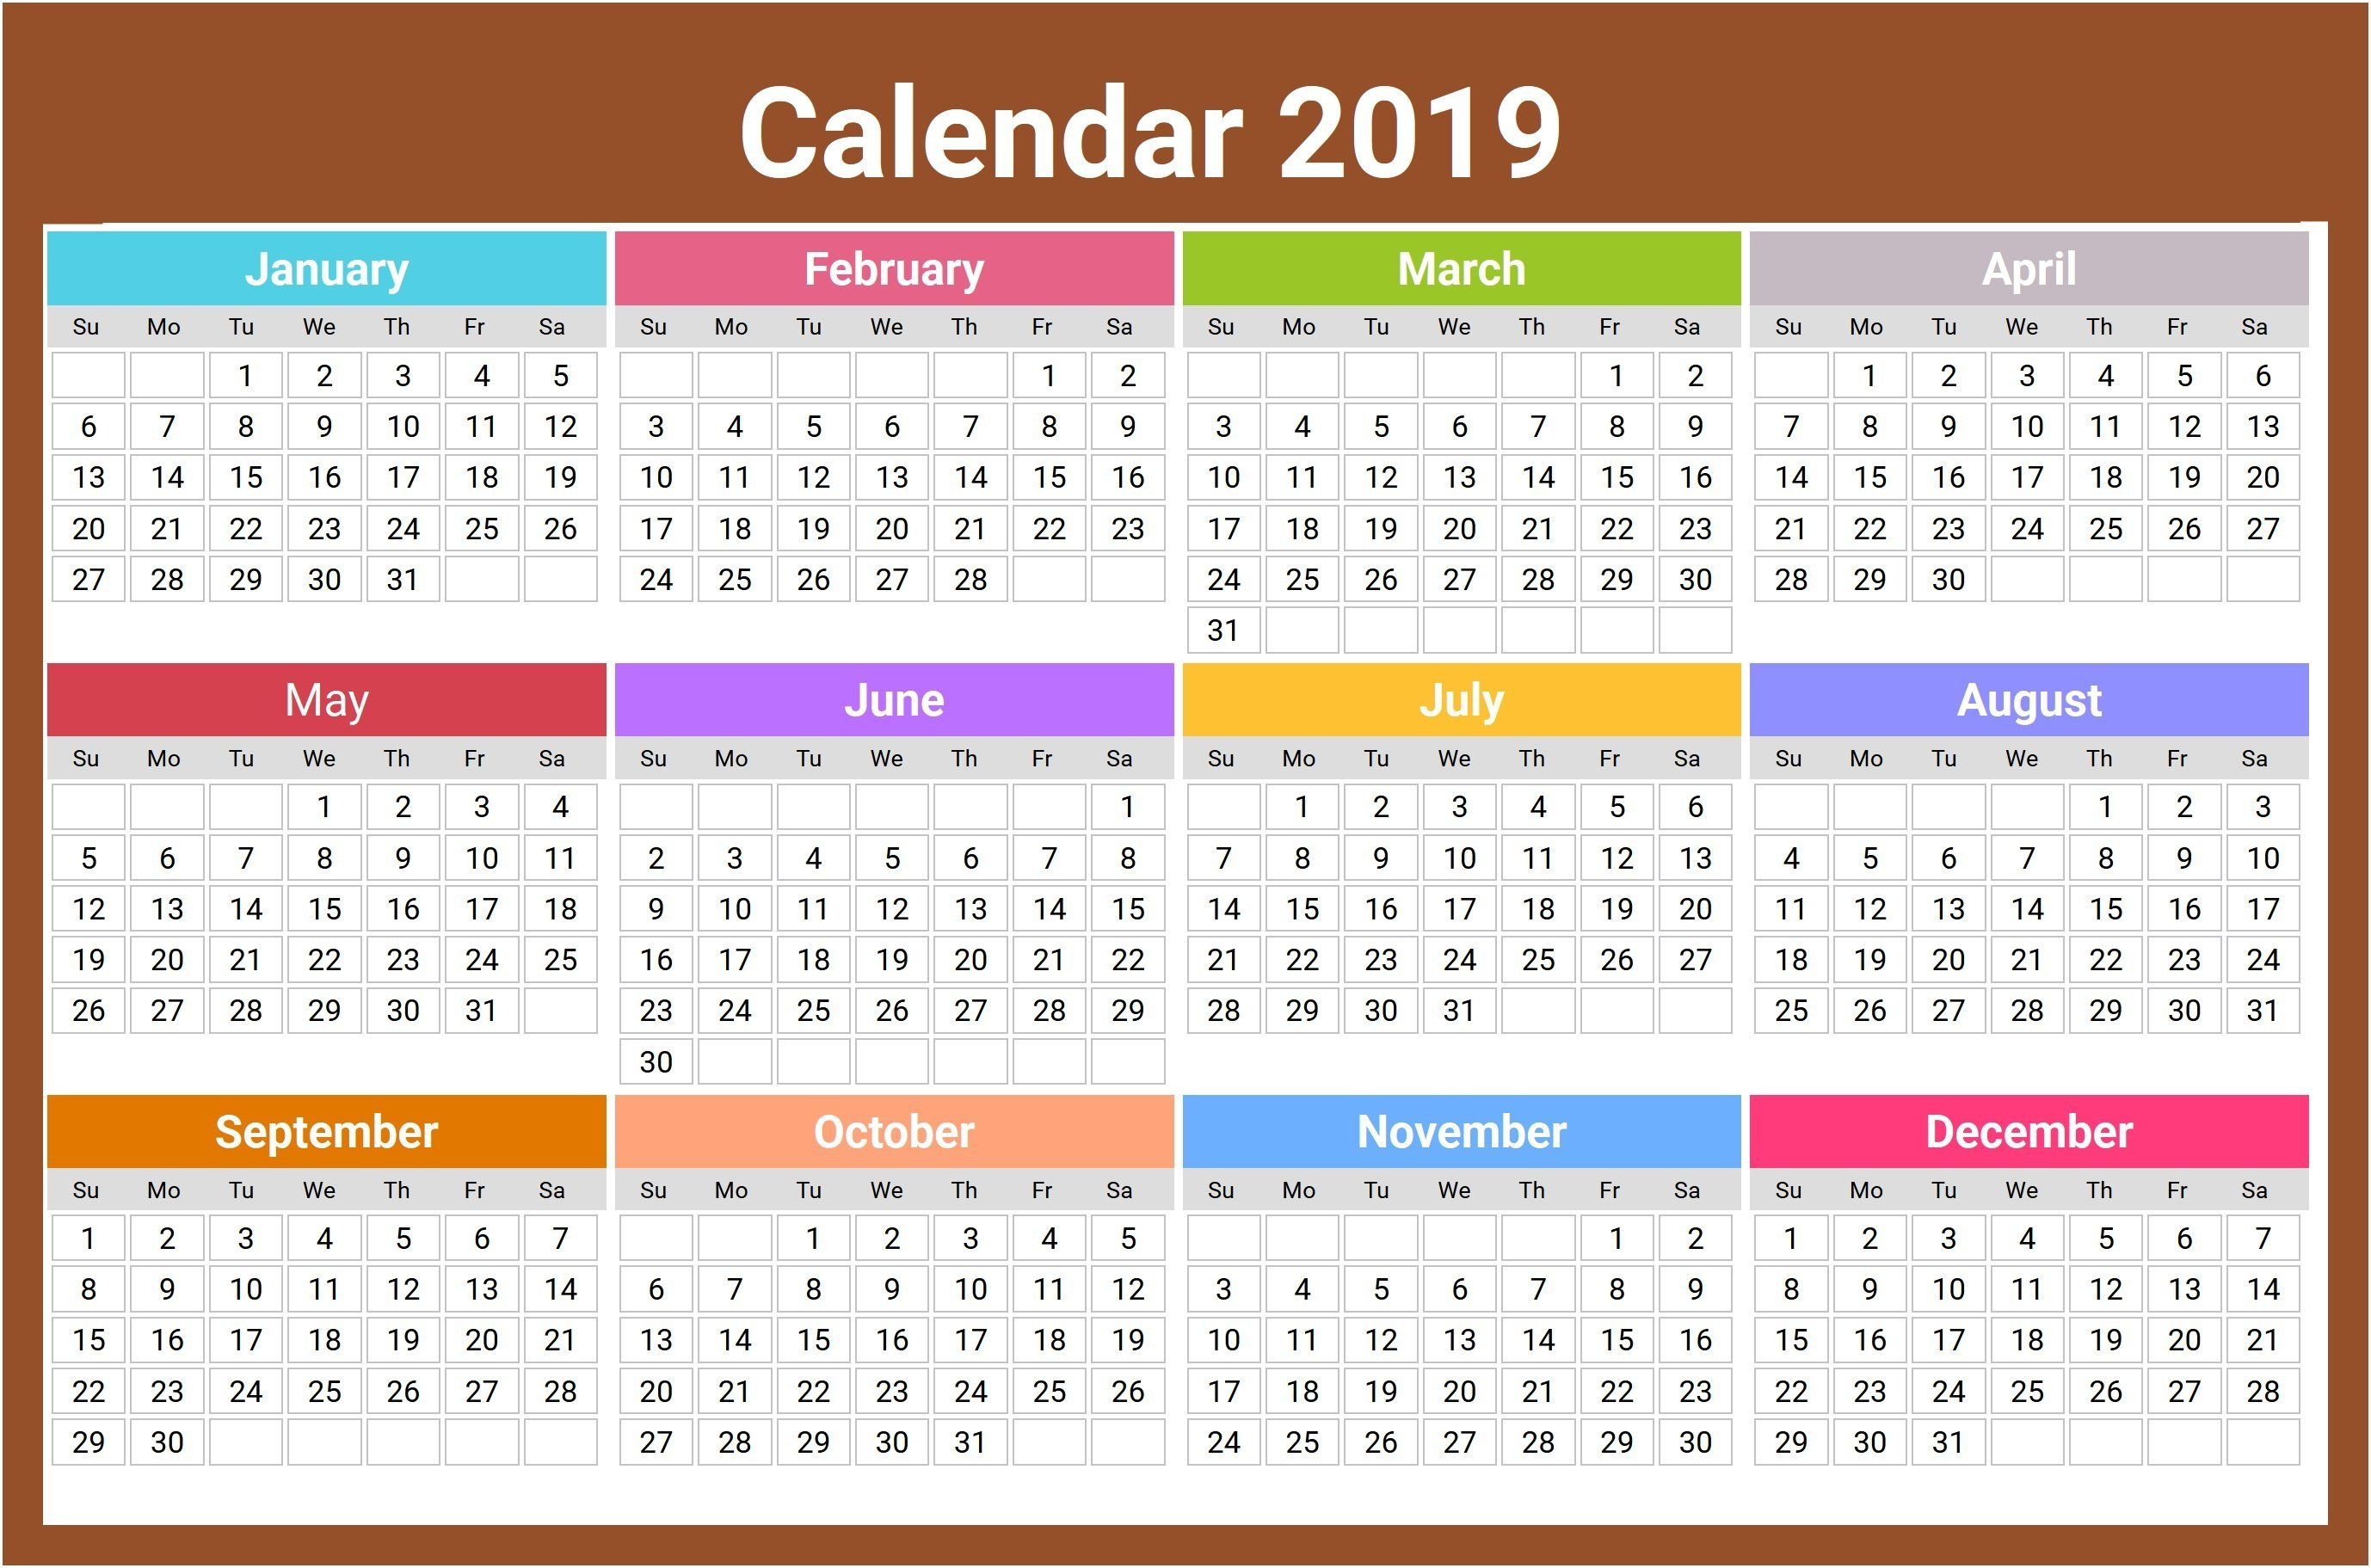 2019 Ka Calendar To Download Or Print | Americanwomanmag Calendar 2019 Ka